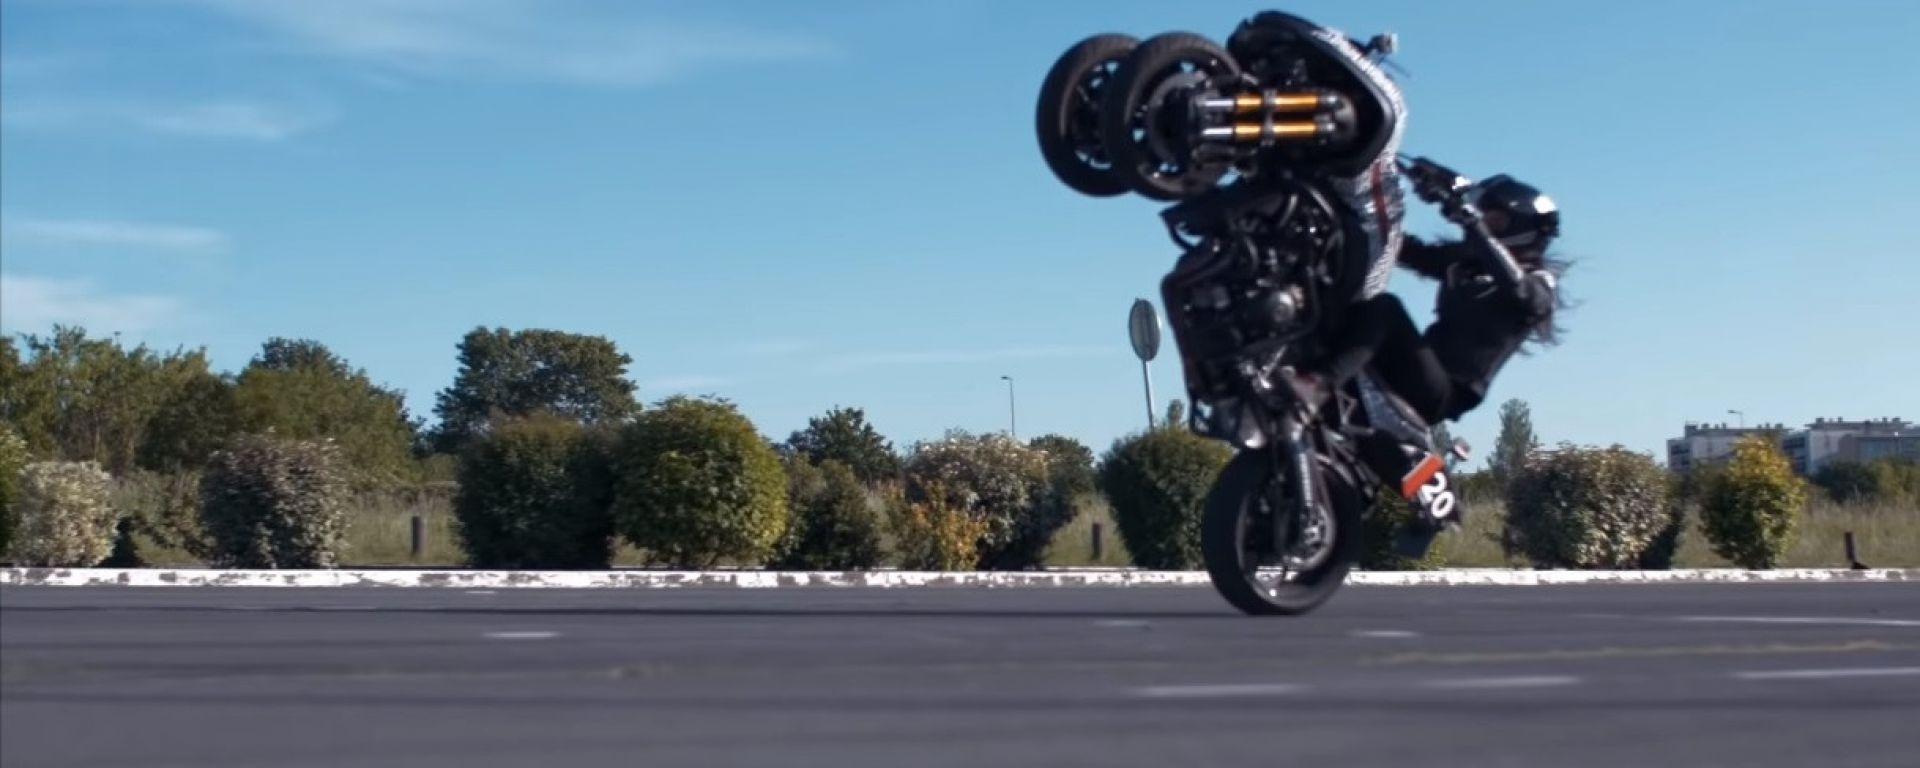 Yamaha Niken: la stuntman Sarah Lezito in impennata